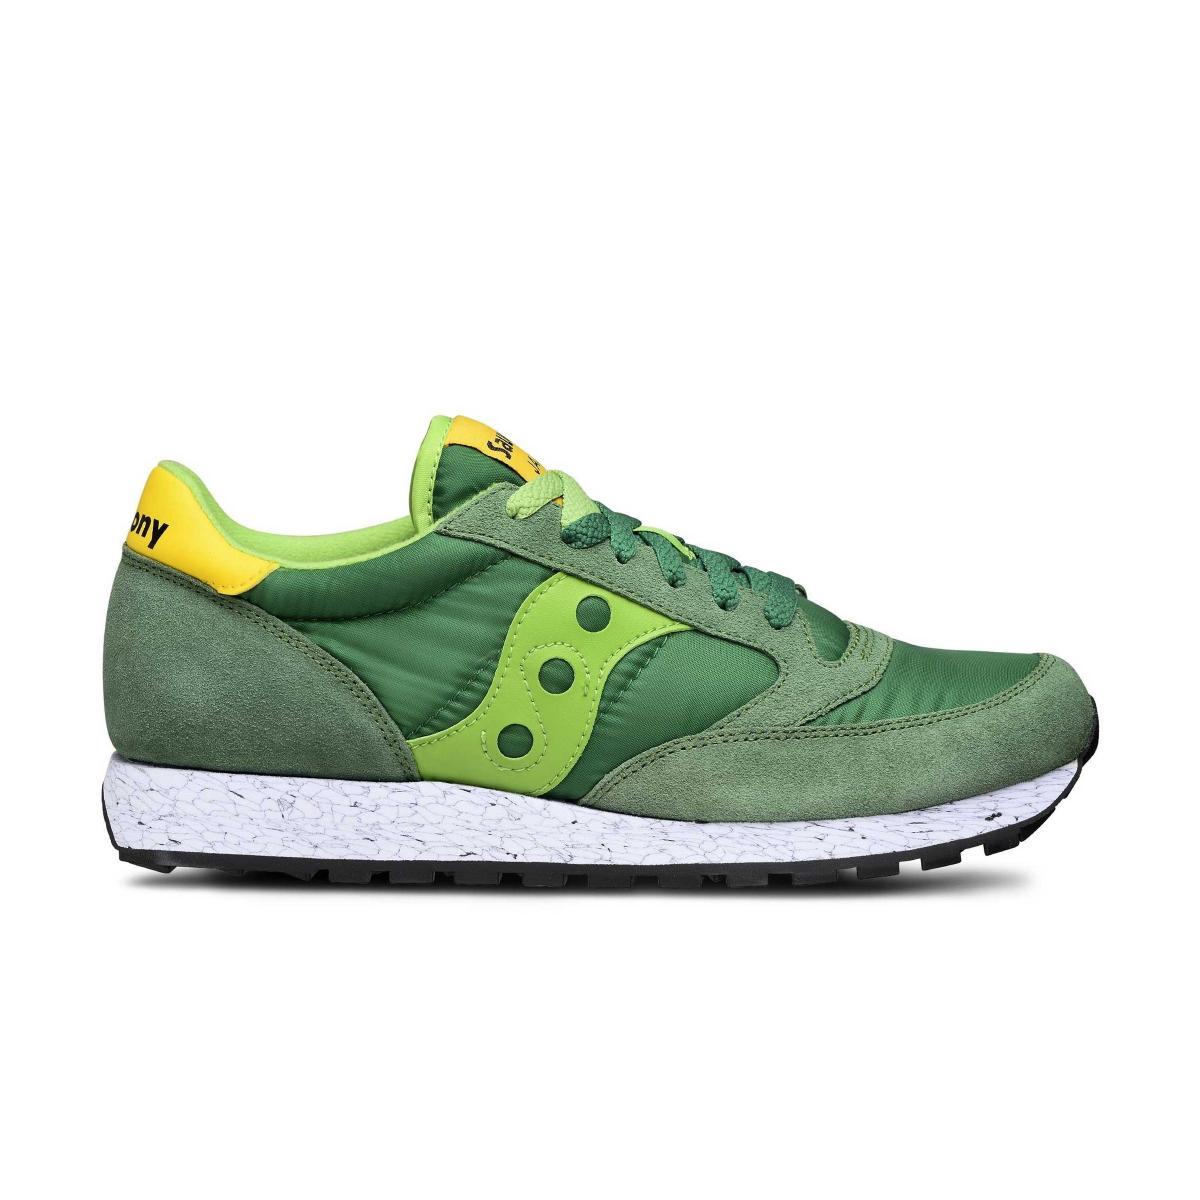 Scarpe Sneakers Saucony Jazz Original da uomo rif. S2044-517